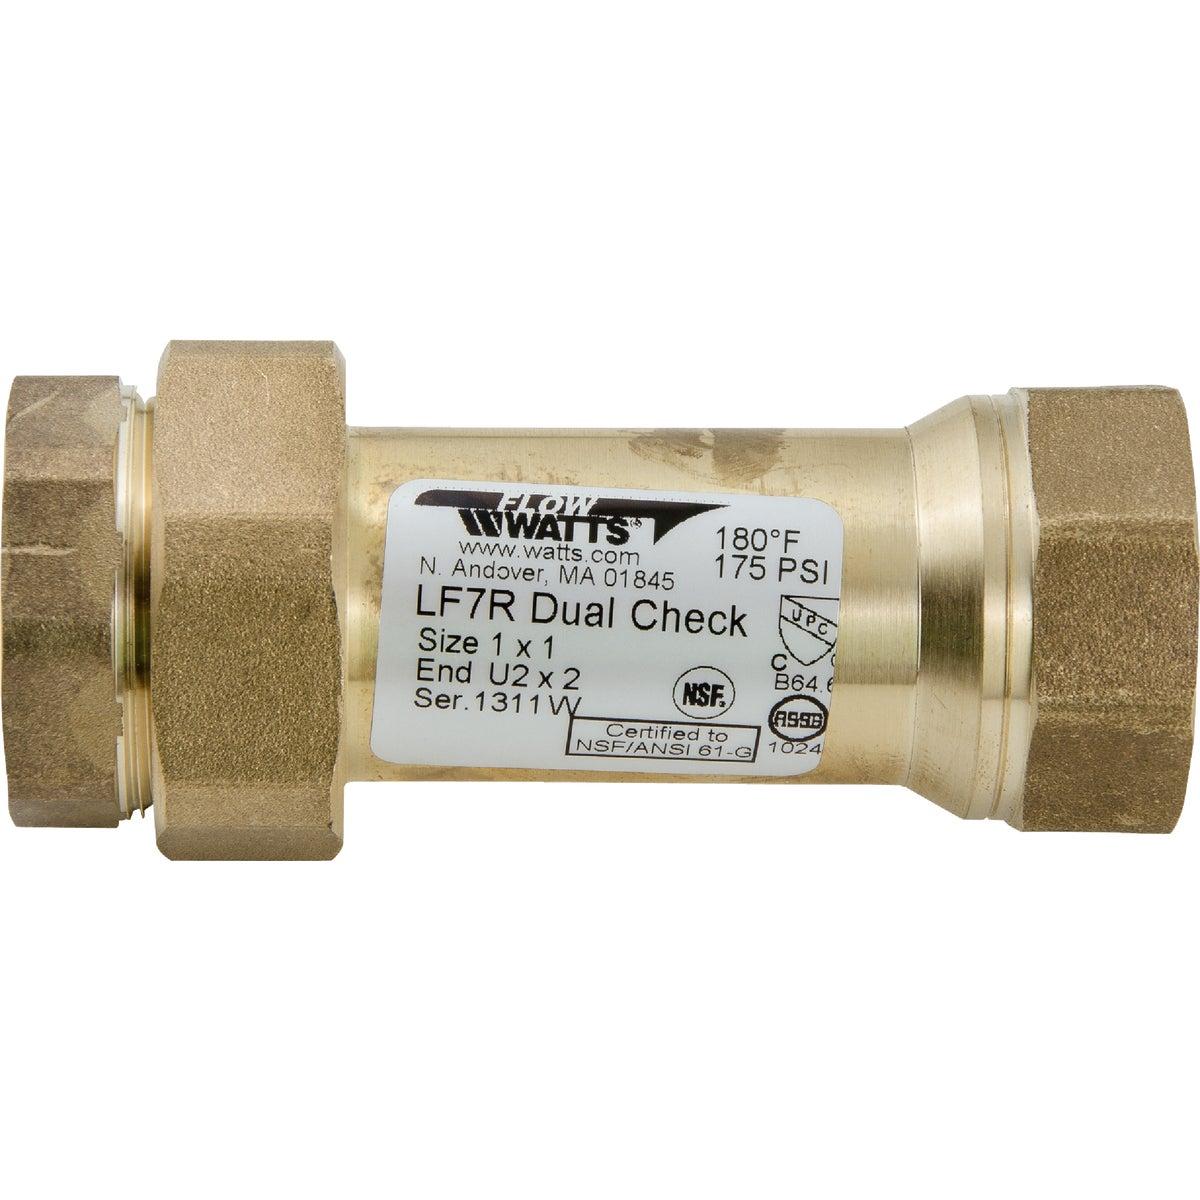 "1"" CHECK VALVE - LF7RU2-2 1 by Watts Regulator Co"